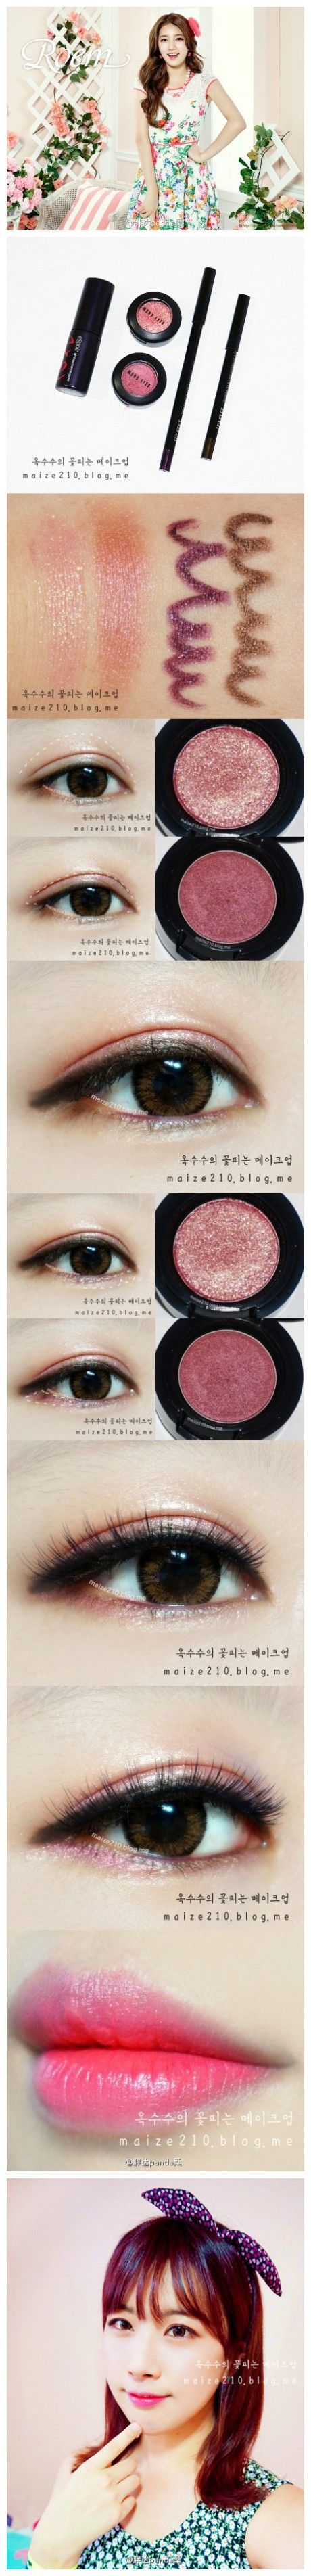 Korean make up ⭐️⭐️ #JoinNerium #DebbieKrug #NeriumKorea www.AsianSkincare.Rocks #style #shopping #styles #outfit #pretty #girl #girls #beauty #beautiful #me #cute #stylish #photooftheday #swag #dress #shoes #diy #design #fashion #Makeup